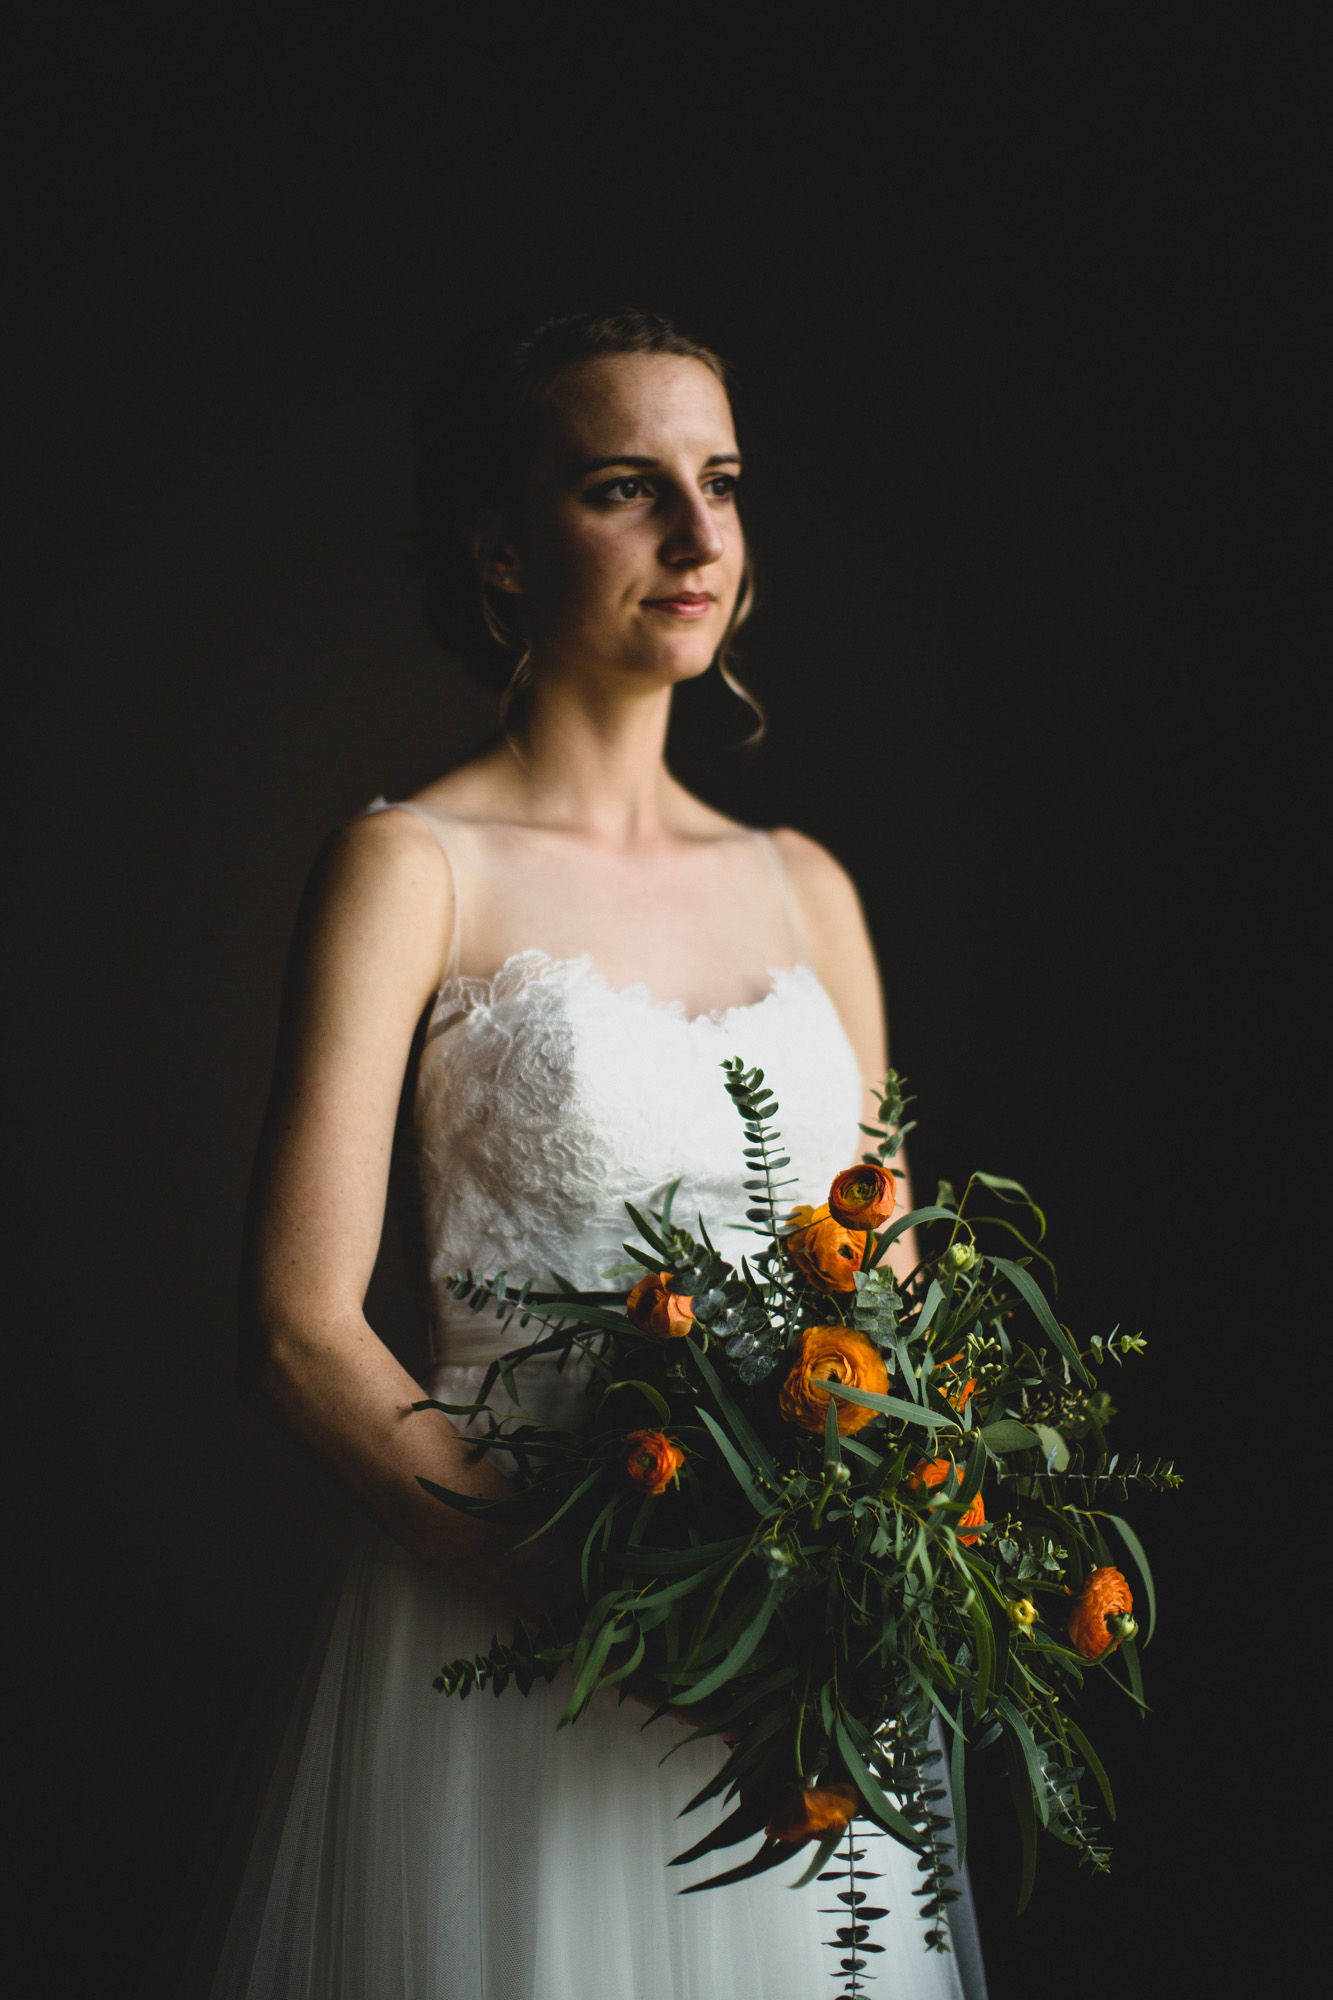 alec_vanderboom_springfield_missouri_wedding-0039.jpg